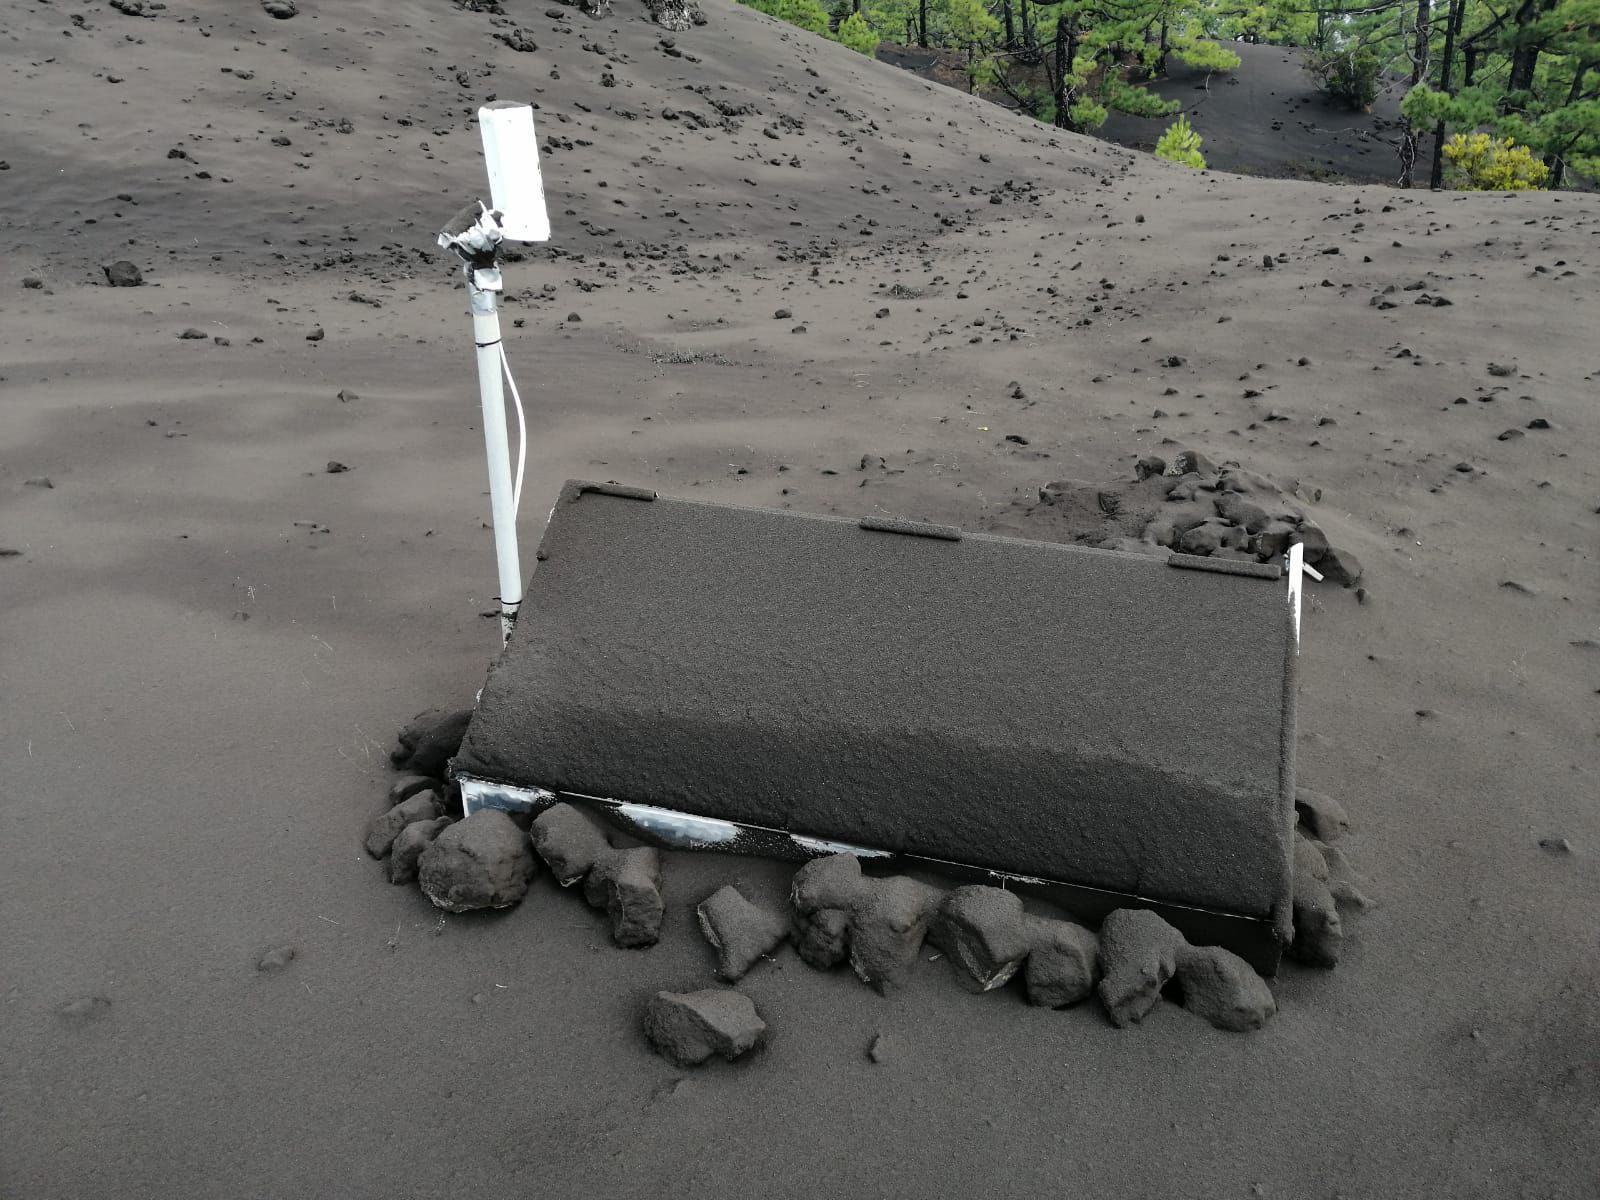 La Palma - ash accumulation on the solar panels of IGNes monitoring stations, requiring constant maintenance - photo Itahiza 26.09.2021